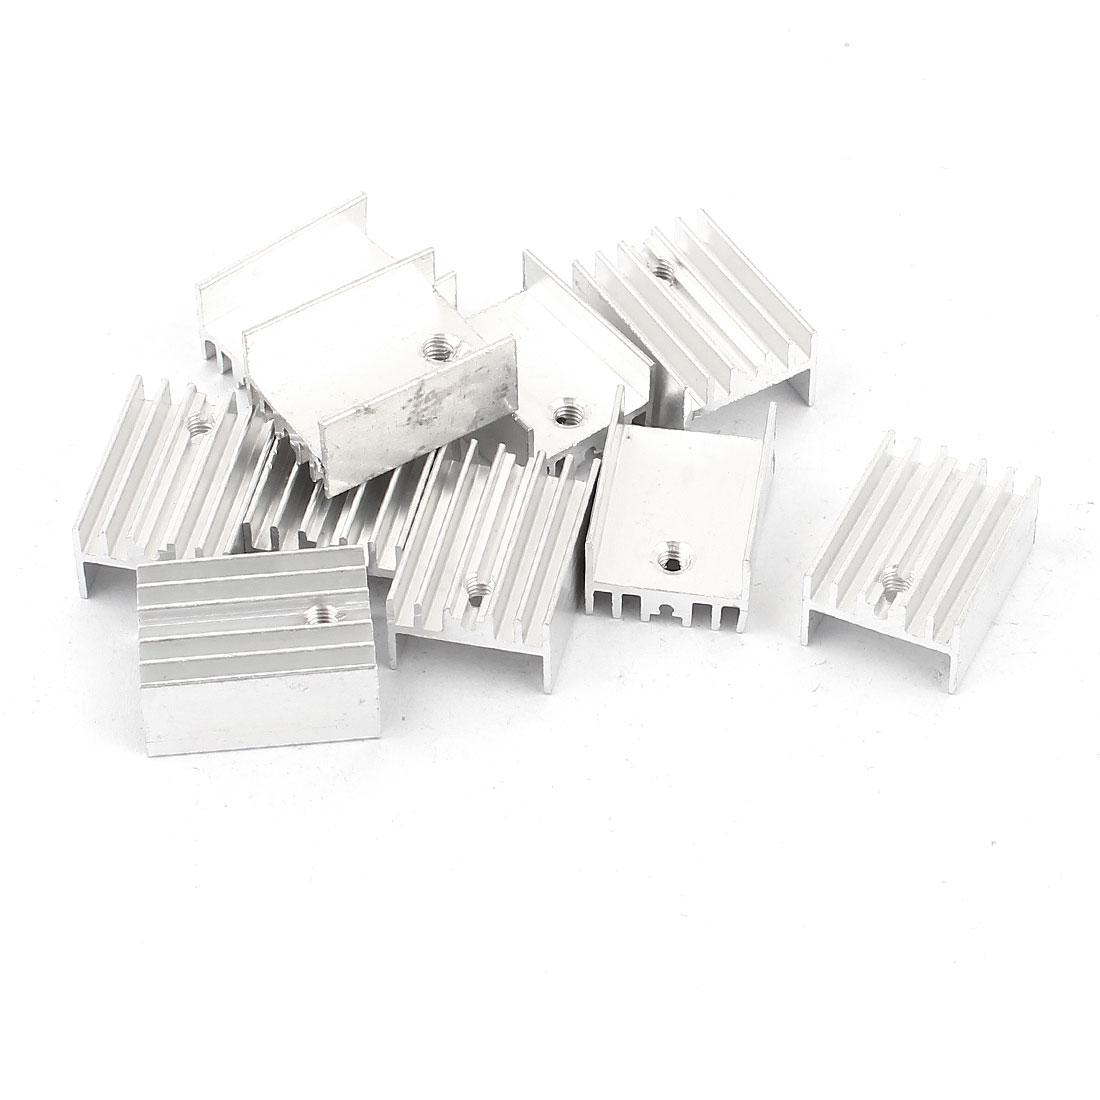 10 Pcs Aluminium 20mmx15mmx10mm Heatsink Radiator Cooling Cooler Fin Silver Tone